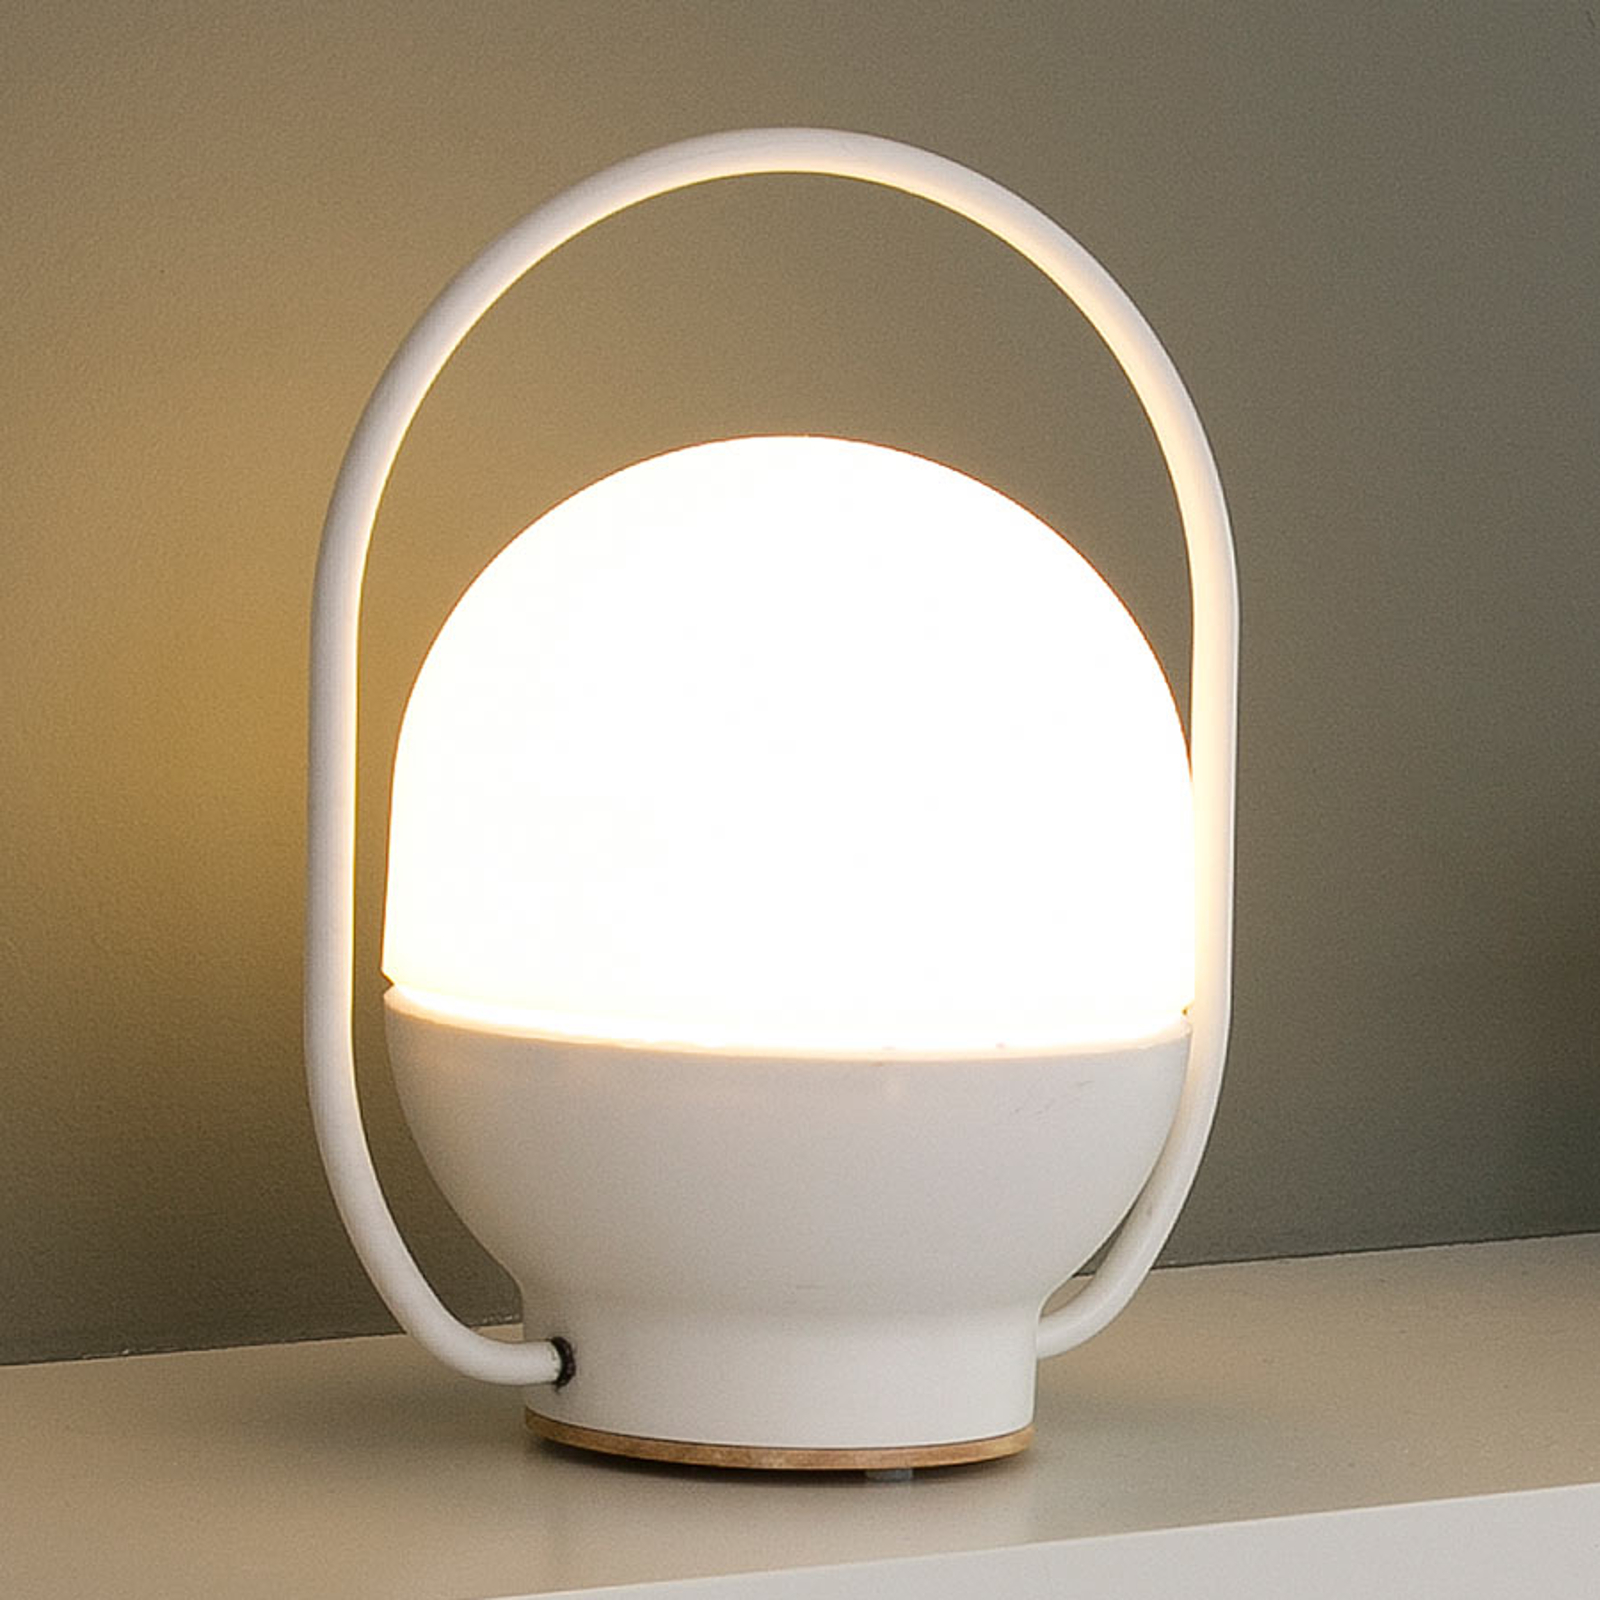 Acquista Lampada LED da tavolo portatile Take away con USB